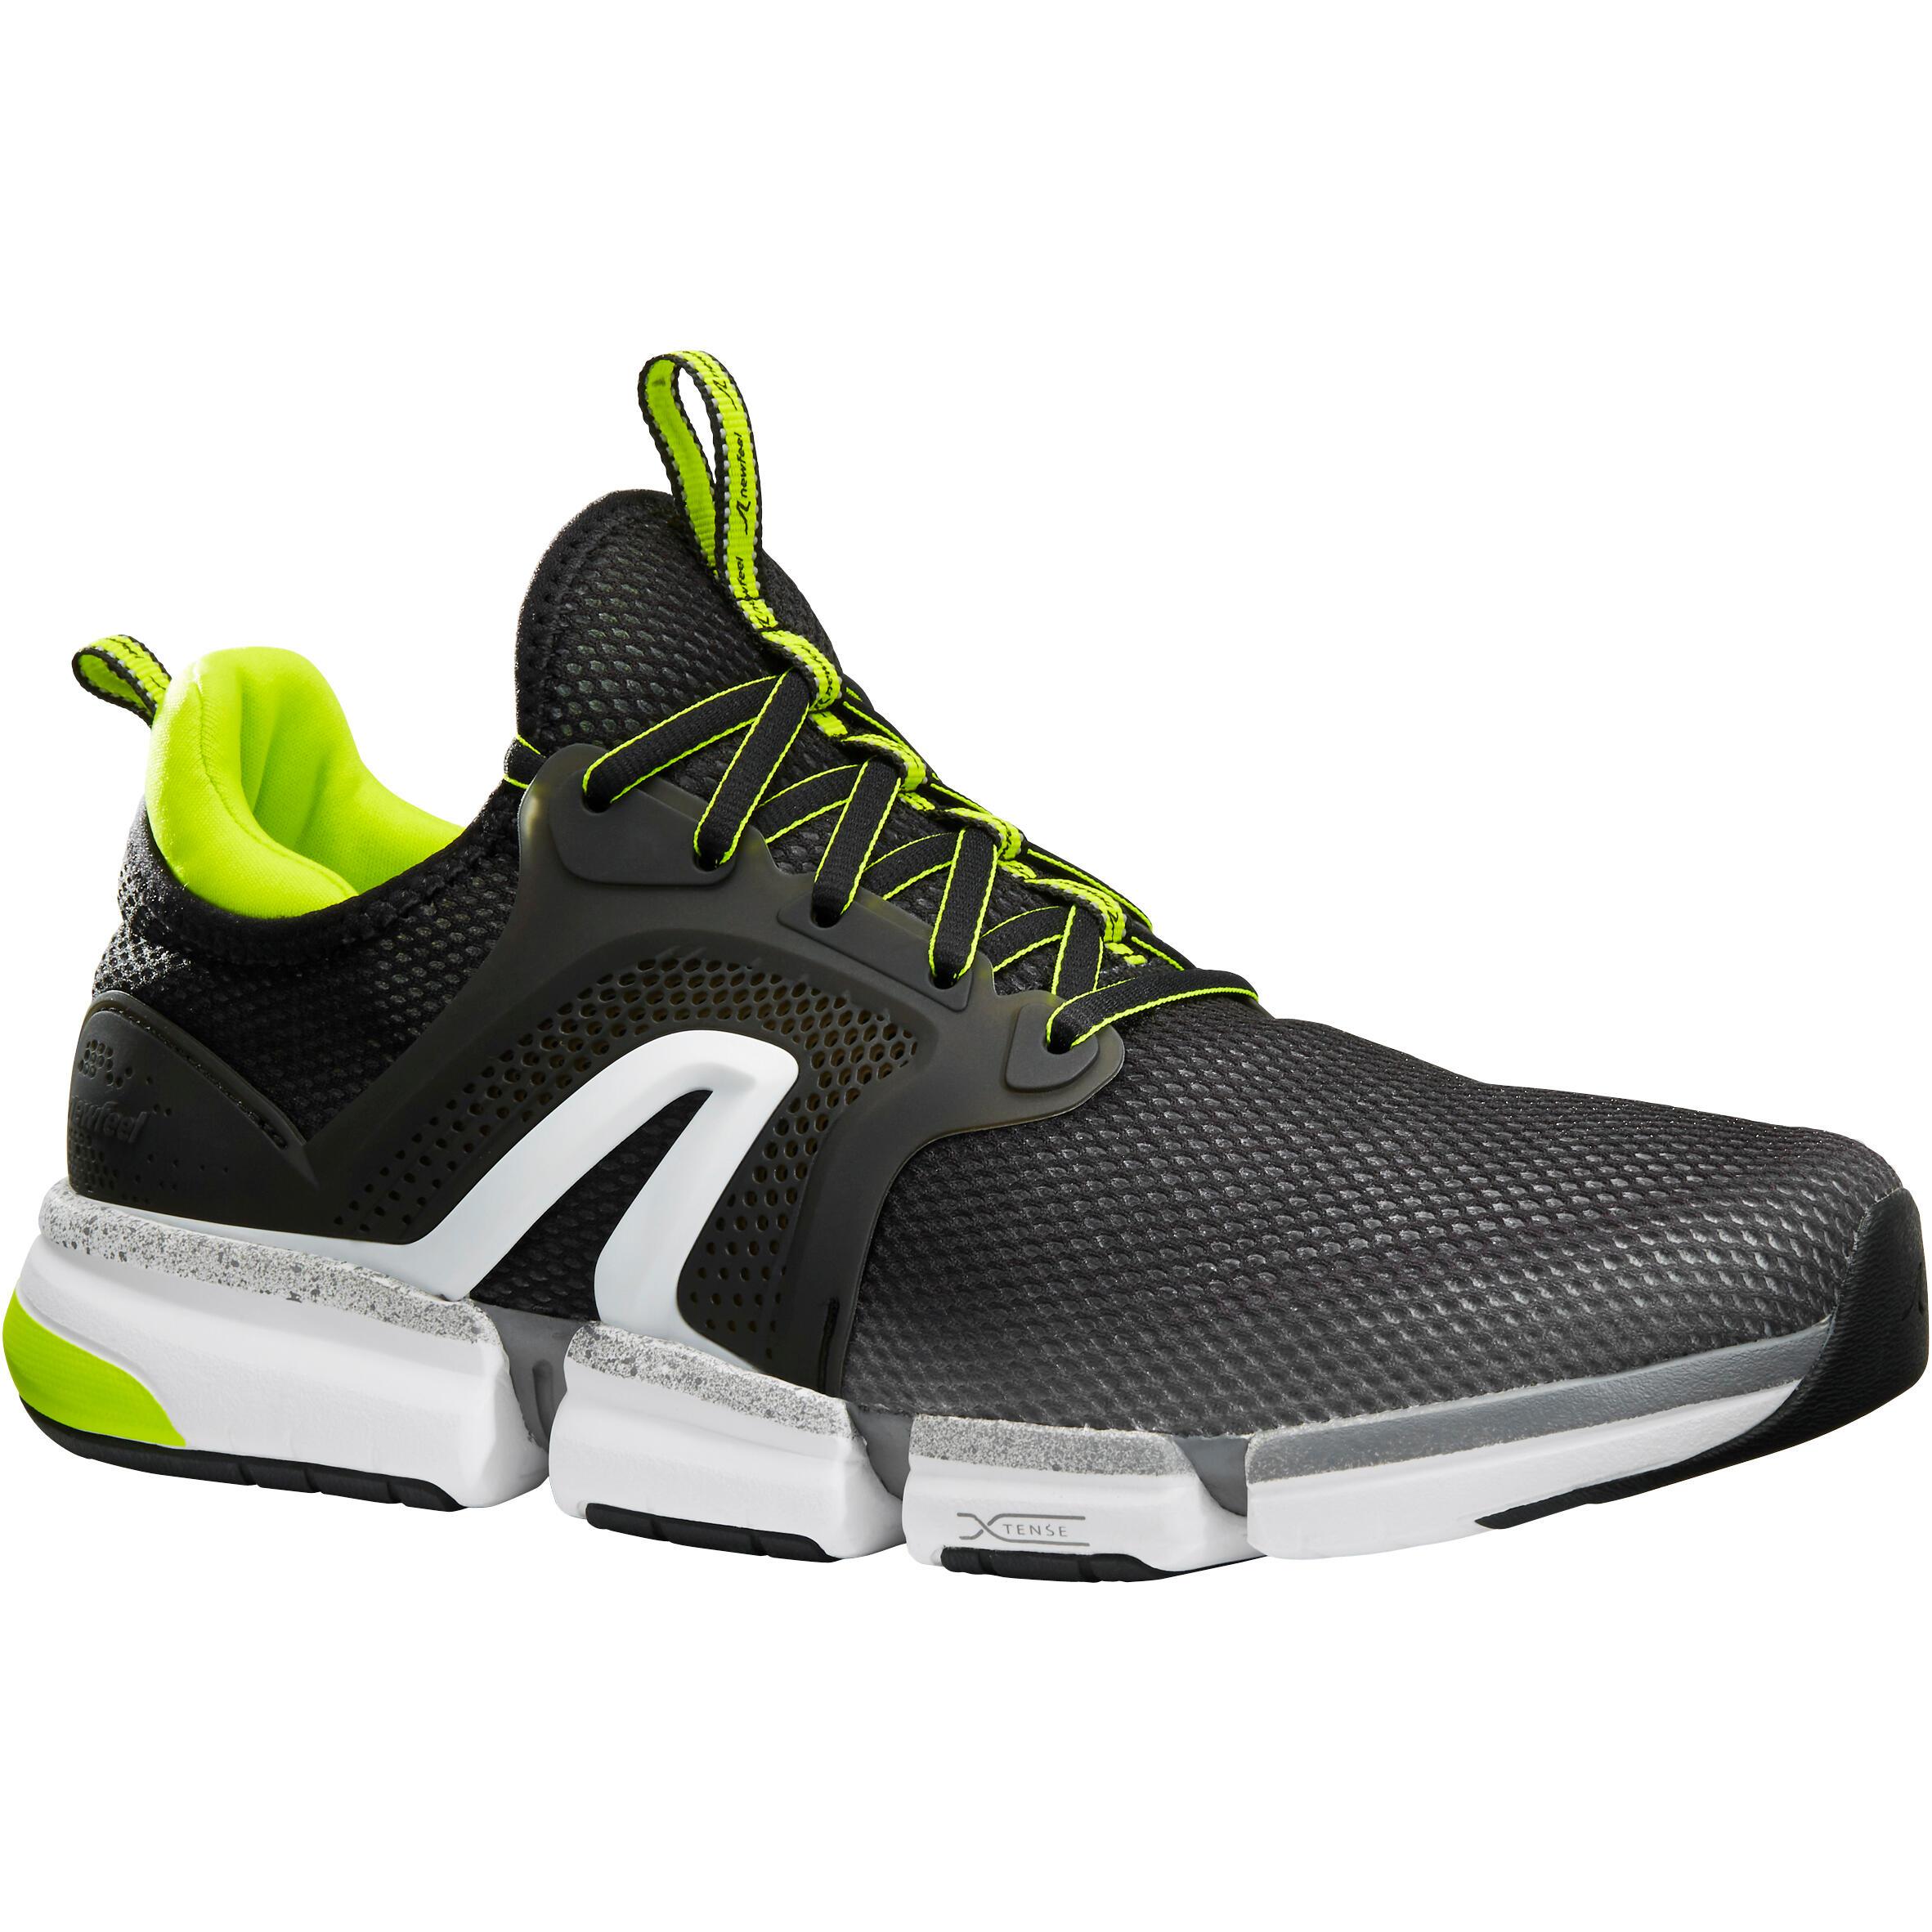 Chaussures marche sportive homme pw 590 xtense gris jaune newfeel